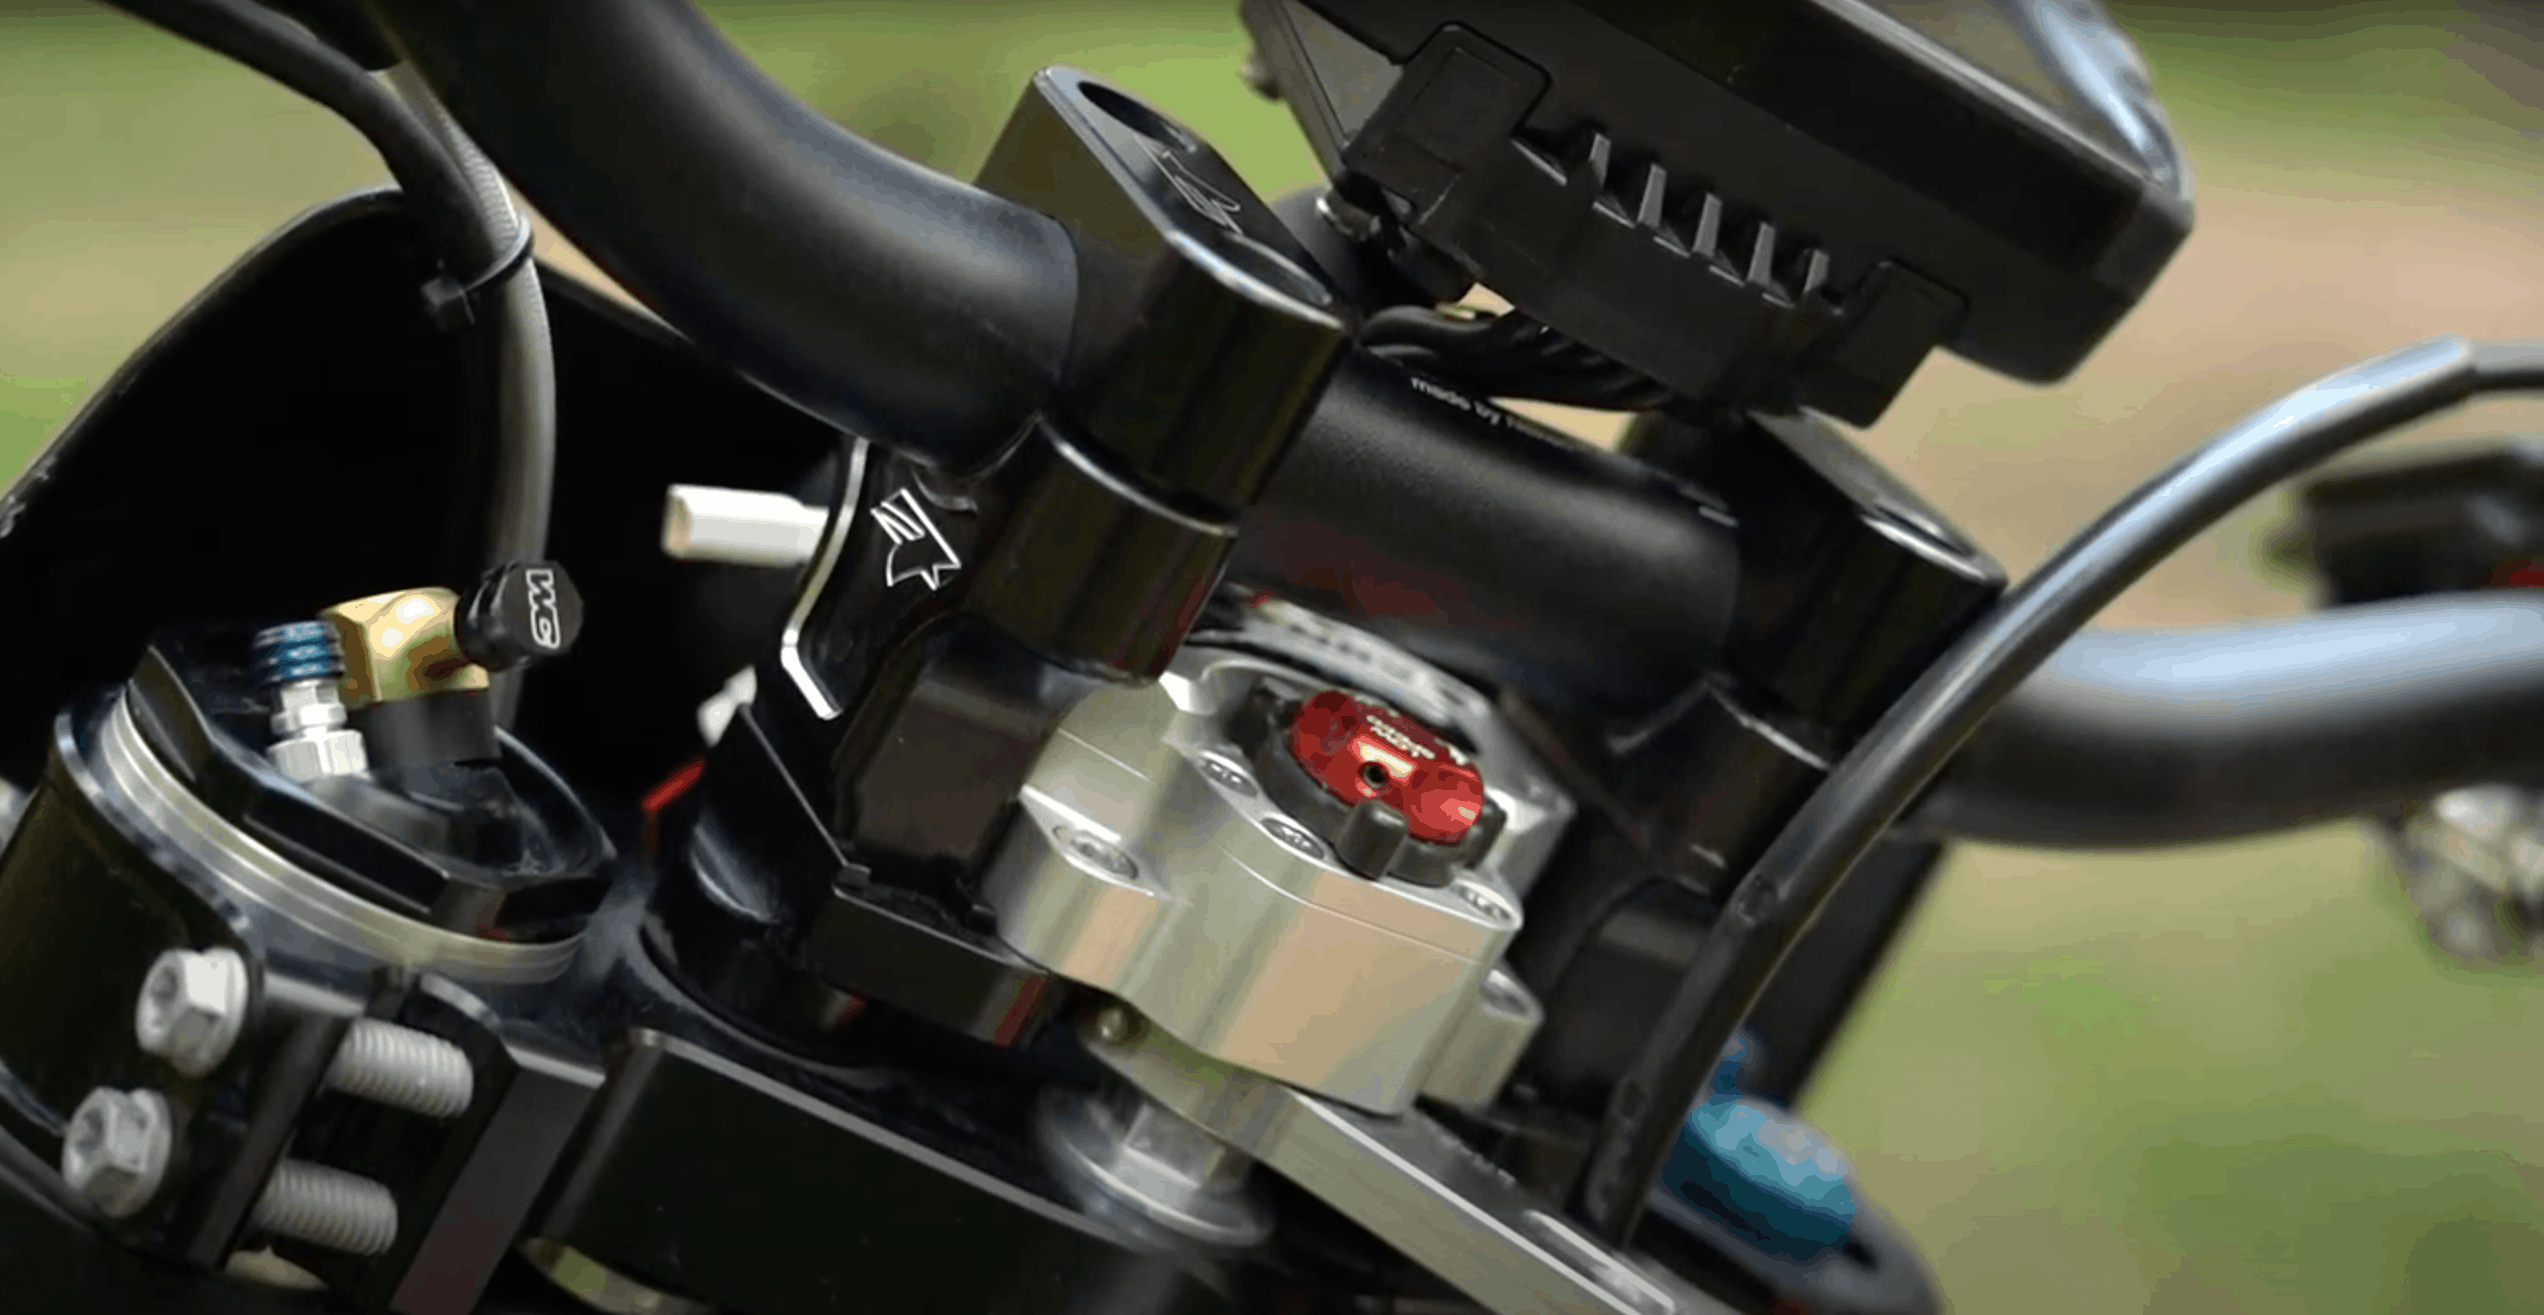 Fastway Steering Stabilizer for KTM 300 XC